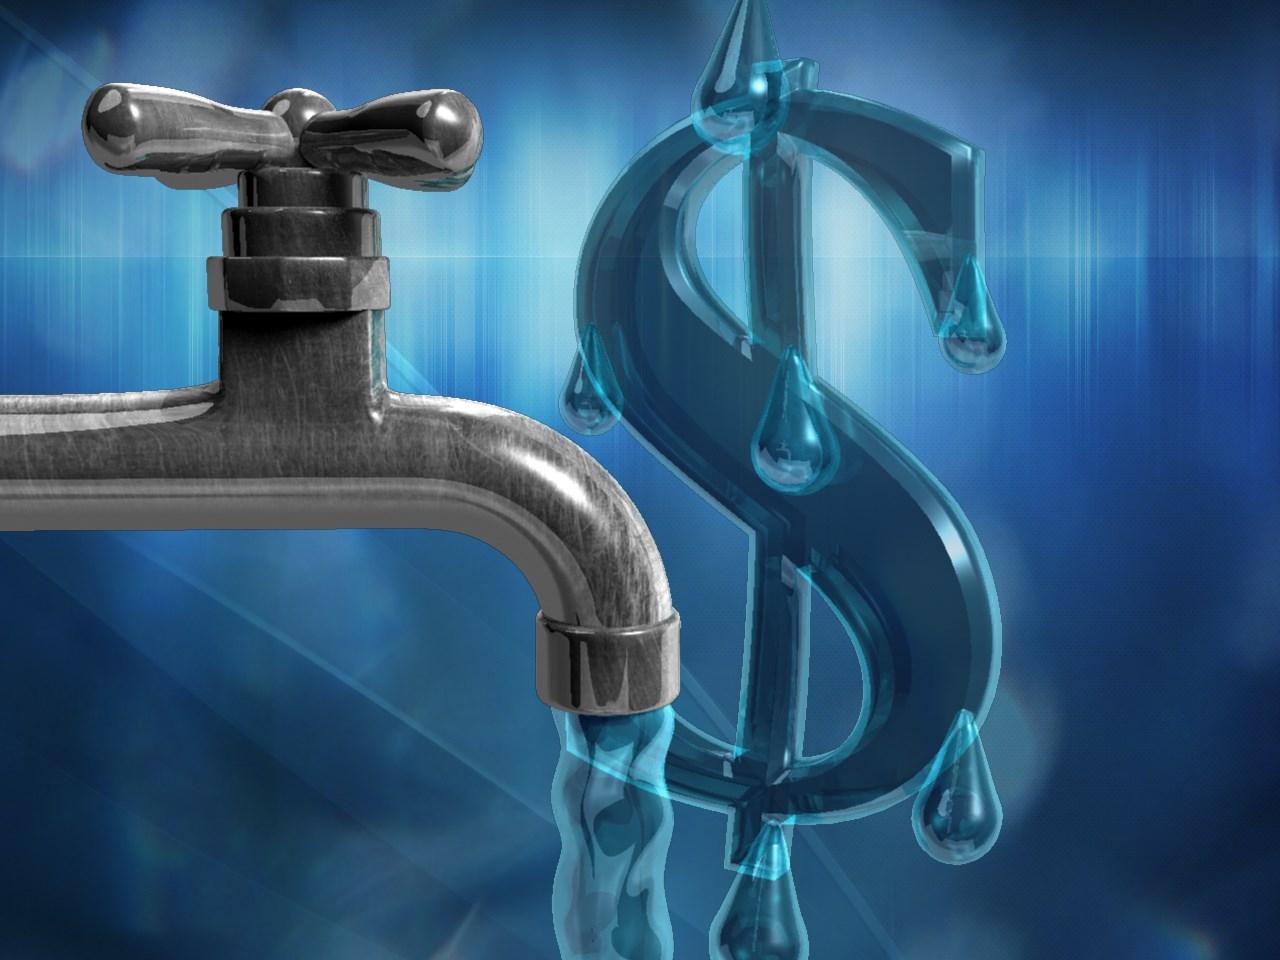 Coachella Valley Water District Raises Rates